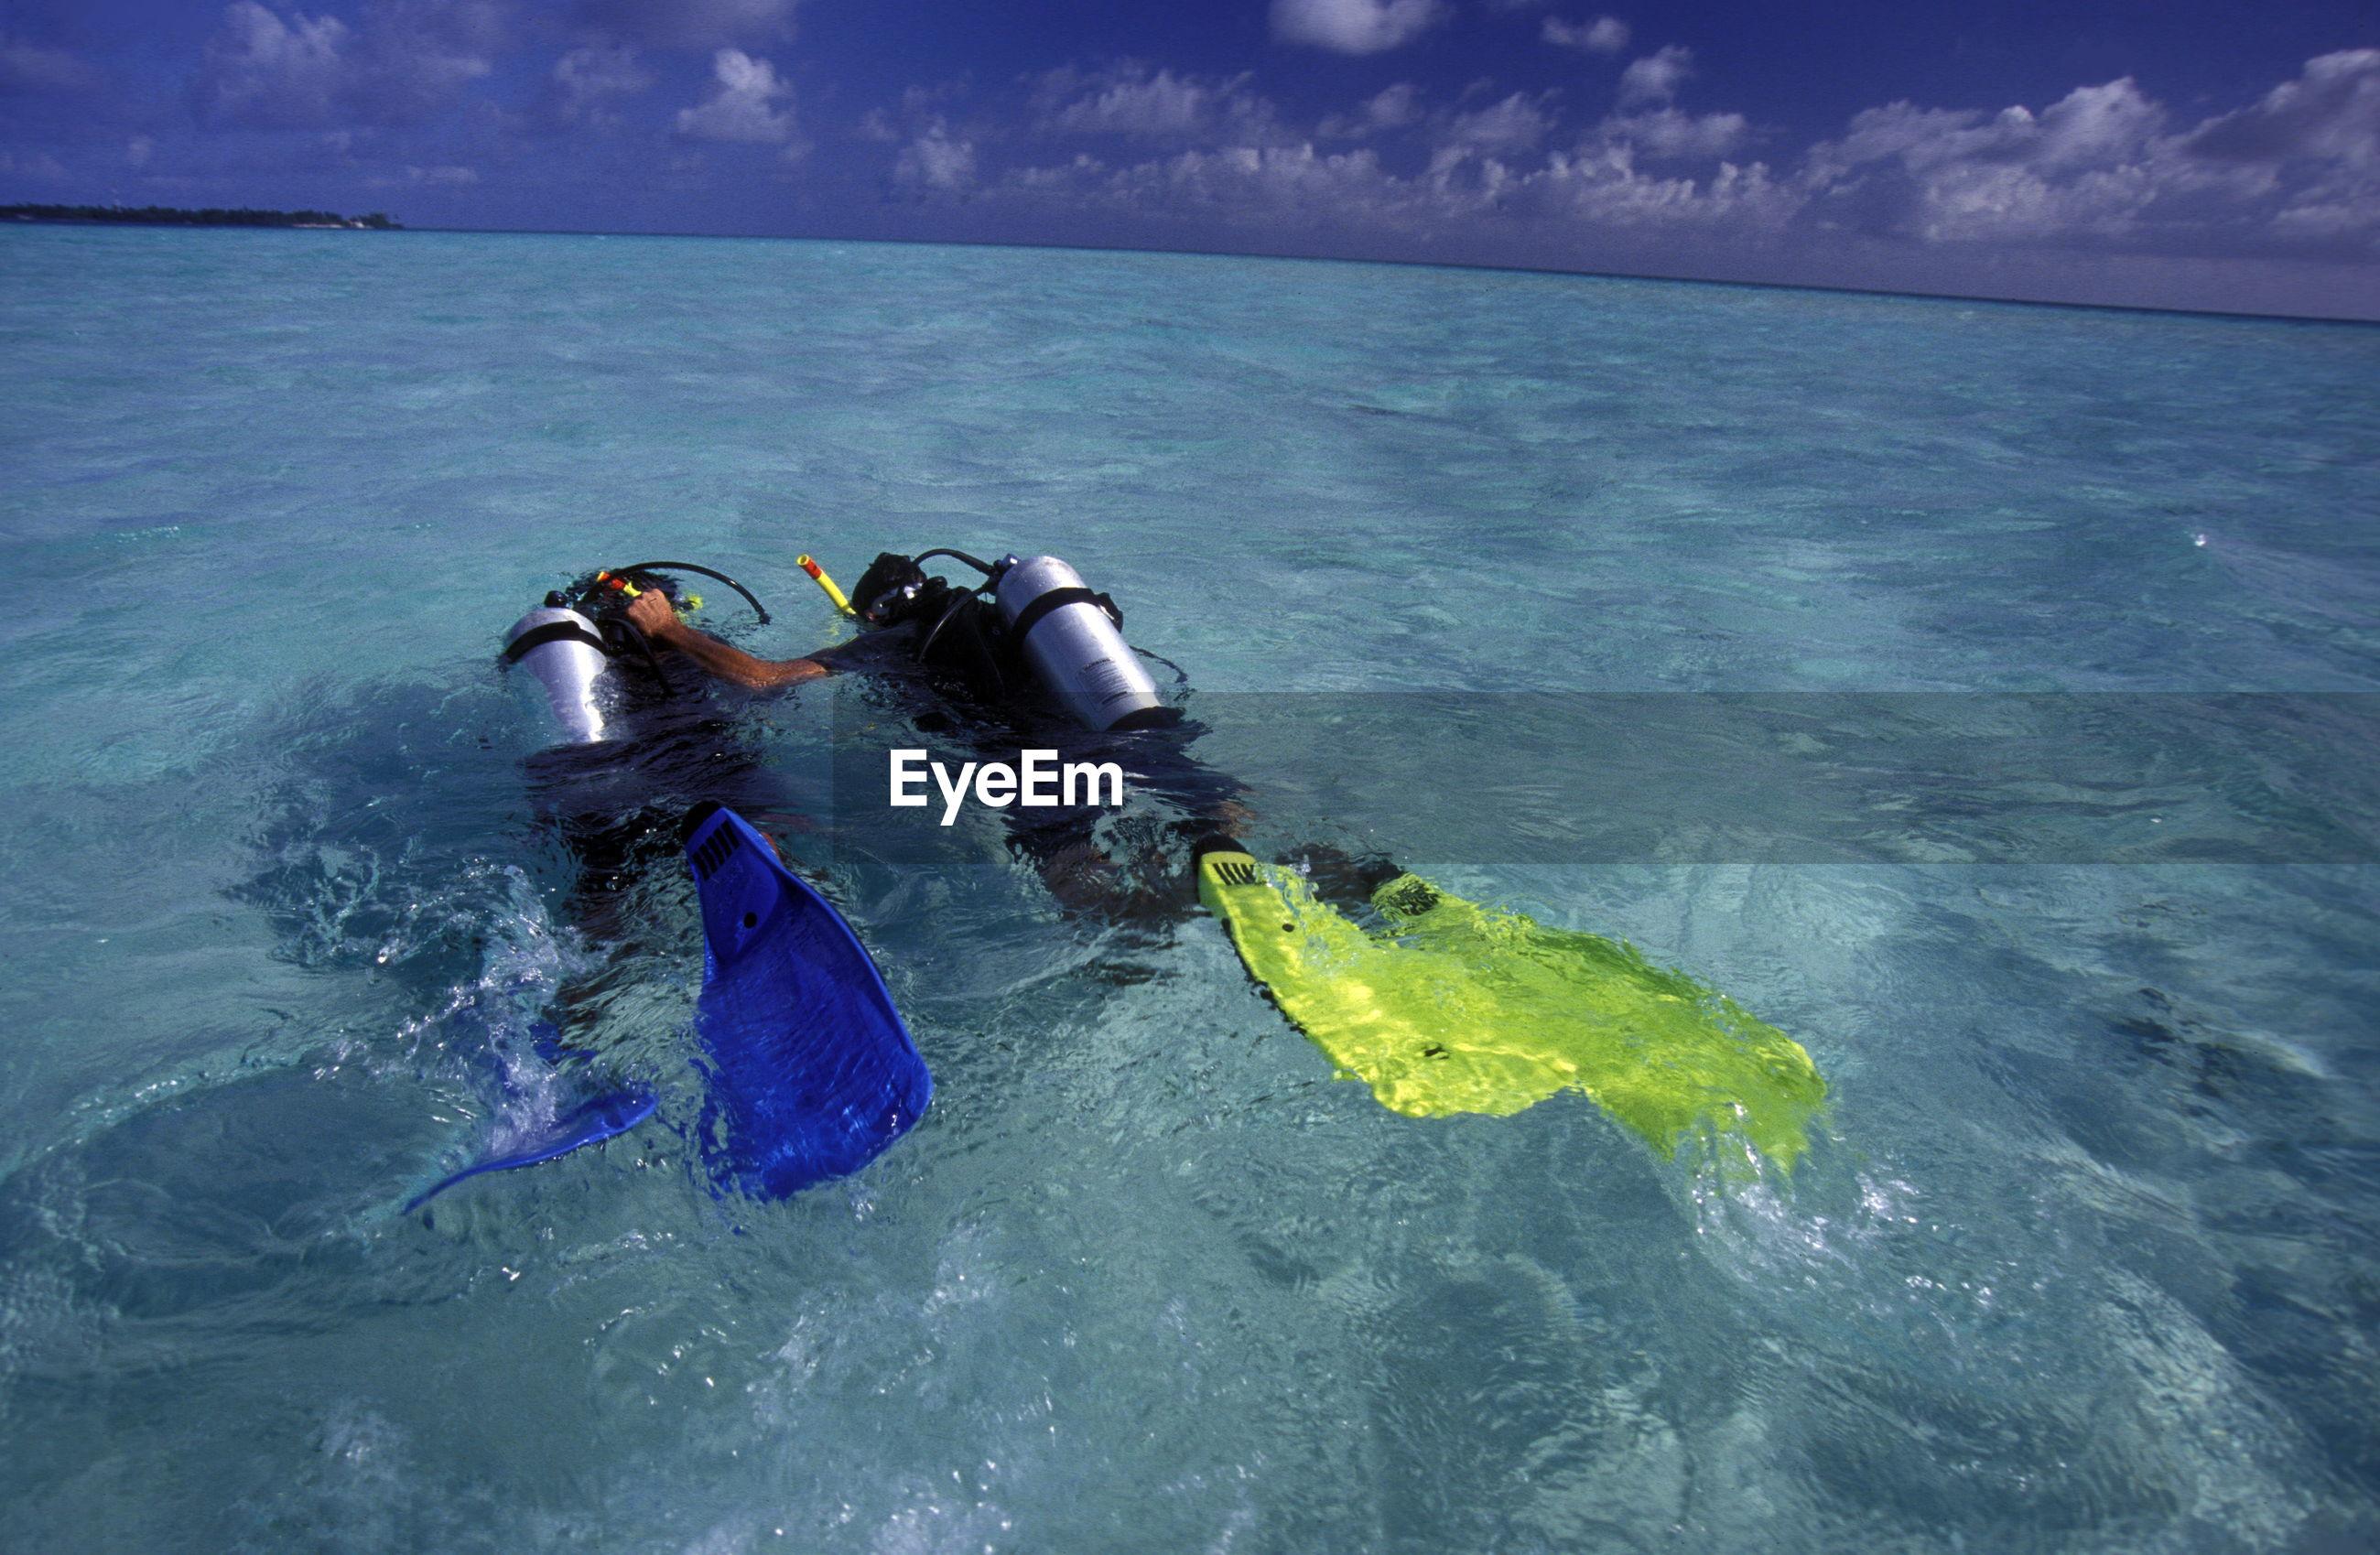 Scuba divers swimming in sea against sky